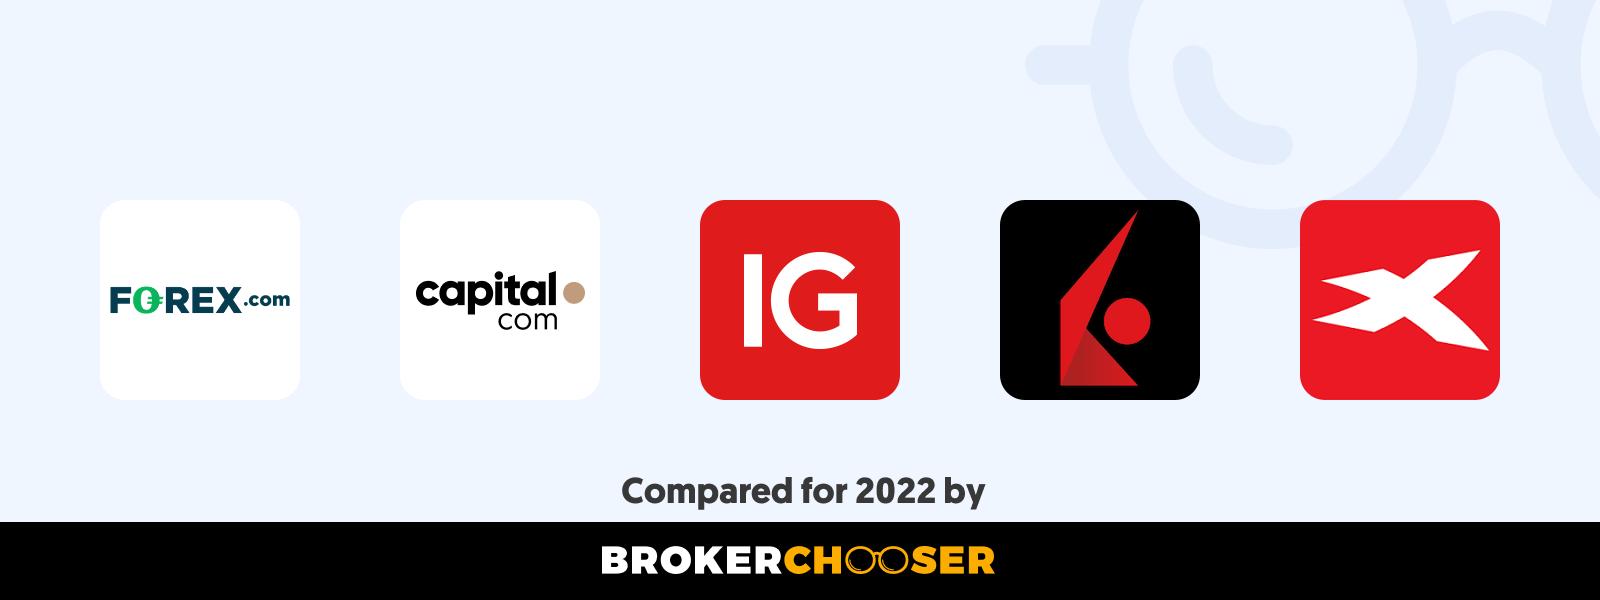 Best forex brokers for beginners in Gambia in 2021